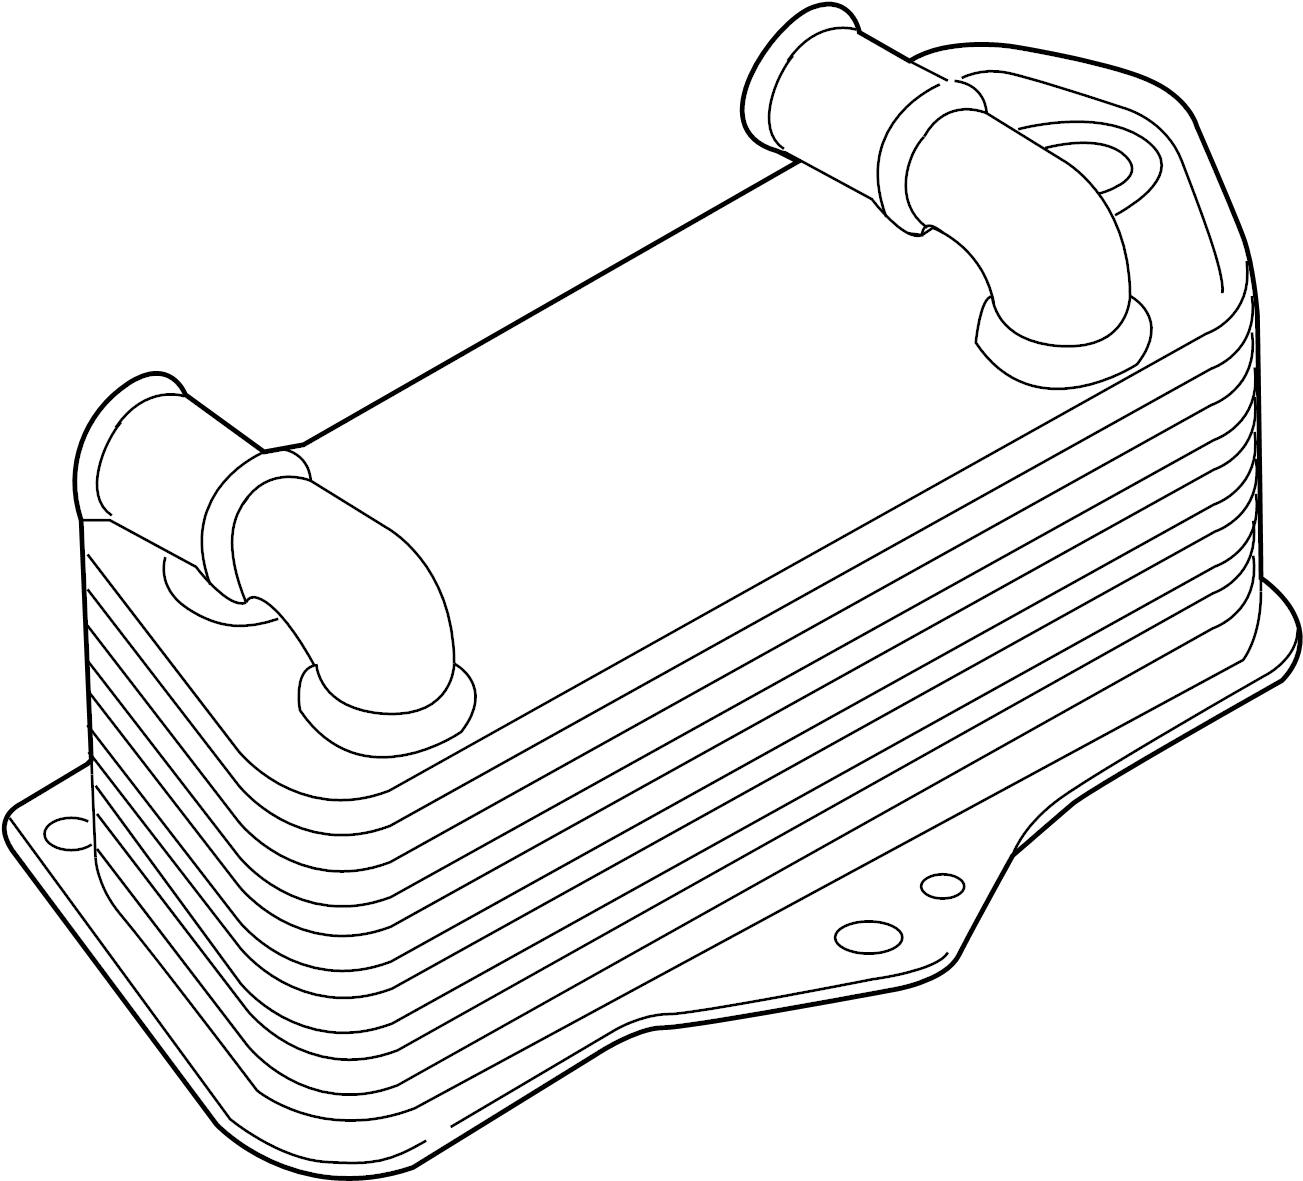 Volkswagen Passat Automatic Transmission Oil Cooler